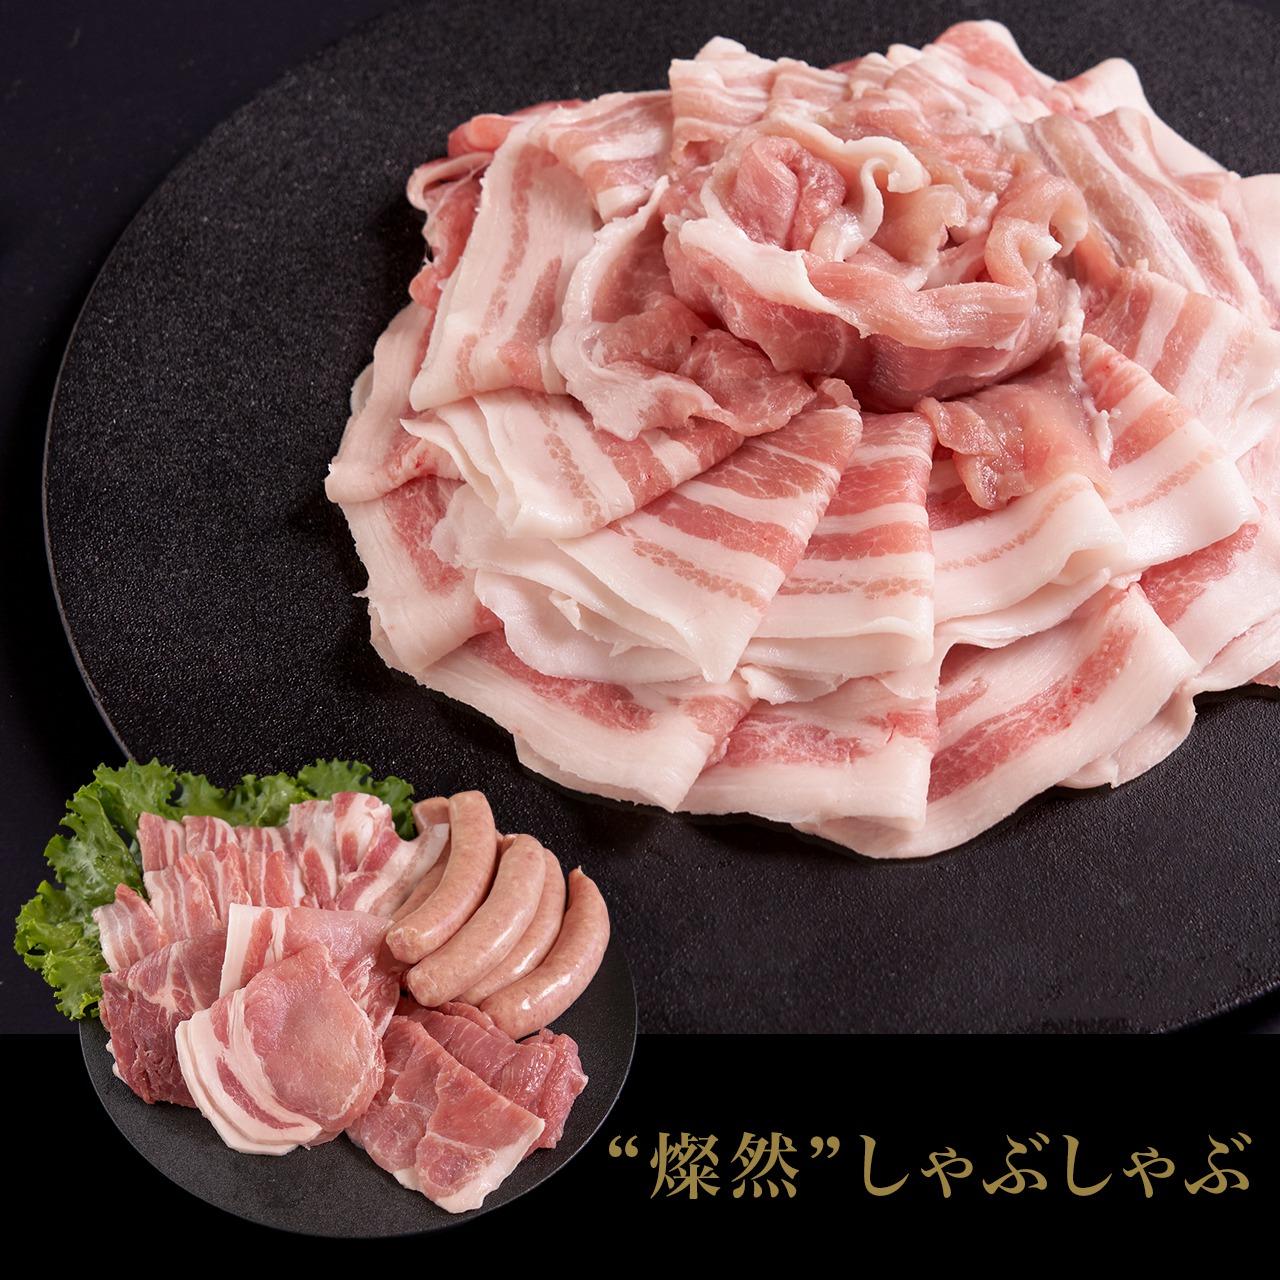 Aoyamam Food Salon 限定 燦然特別仕様 しゃぶしゃぶ ー 誉 ー